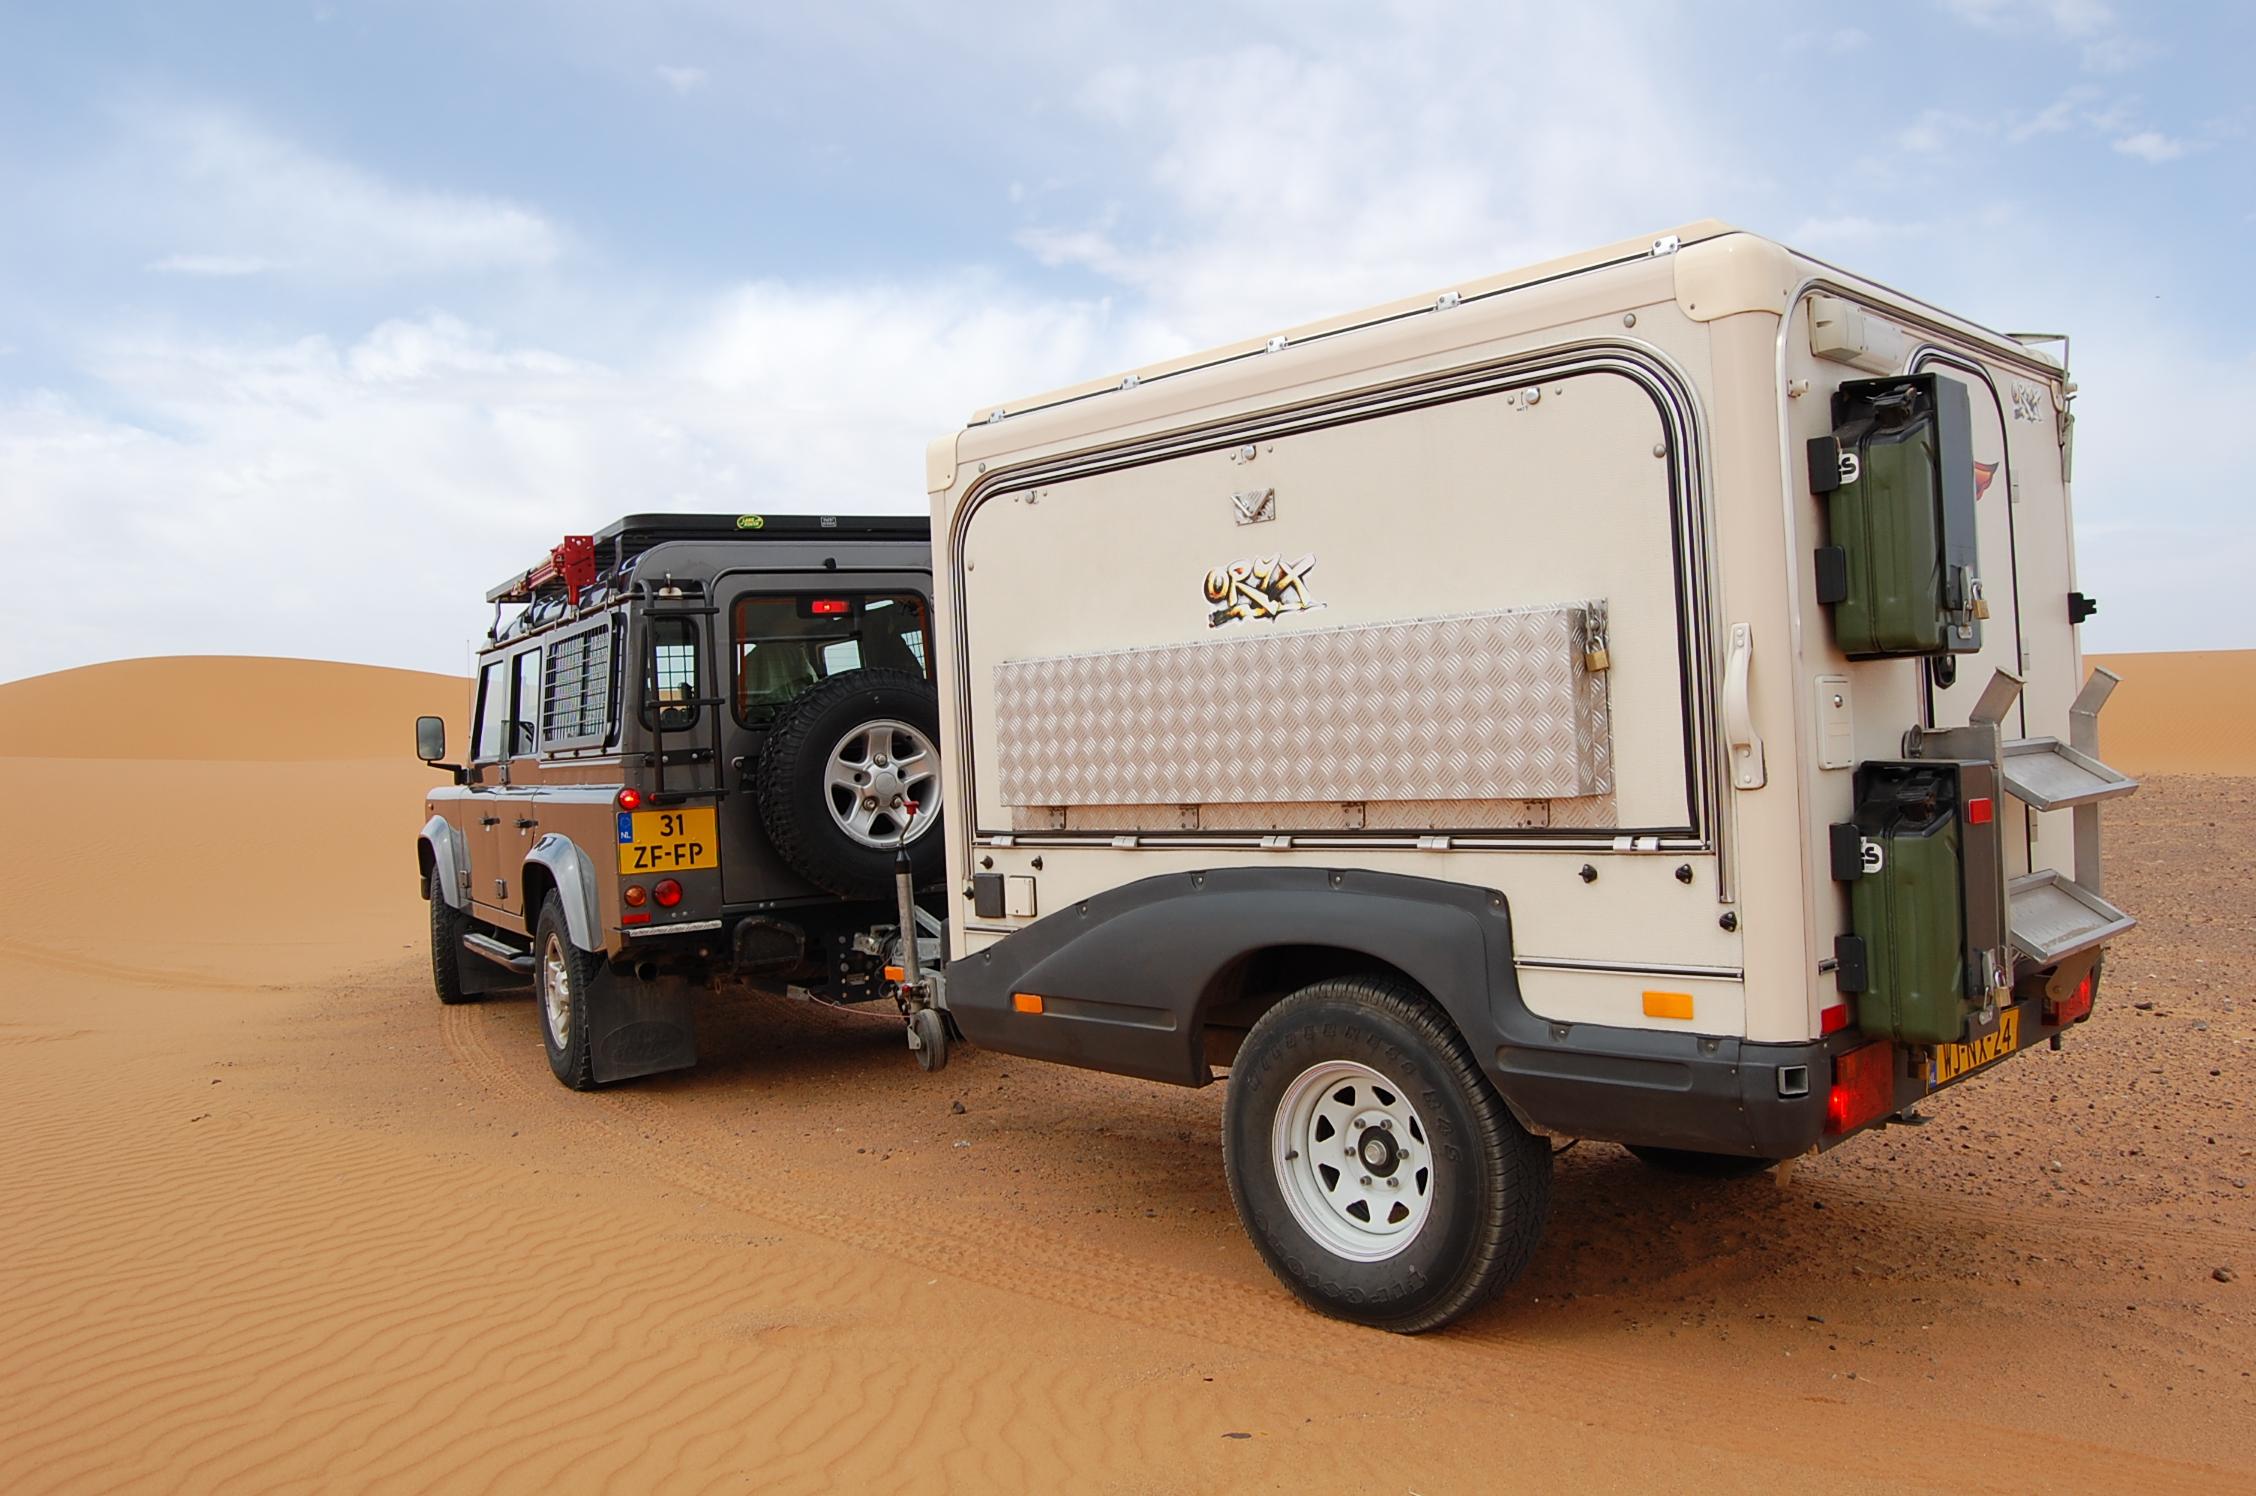 caravanes 4x4 ( spécial Maroc ) 463491Marokko2010377